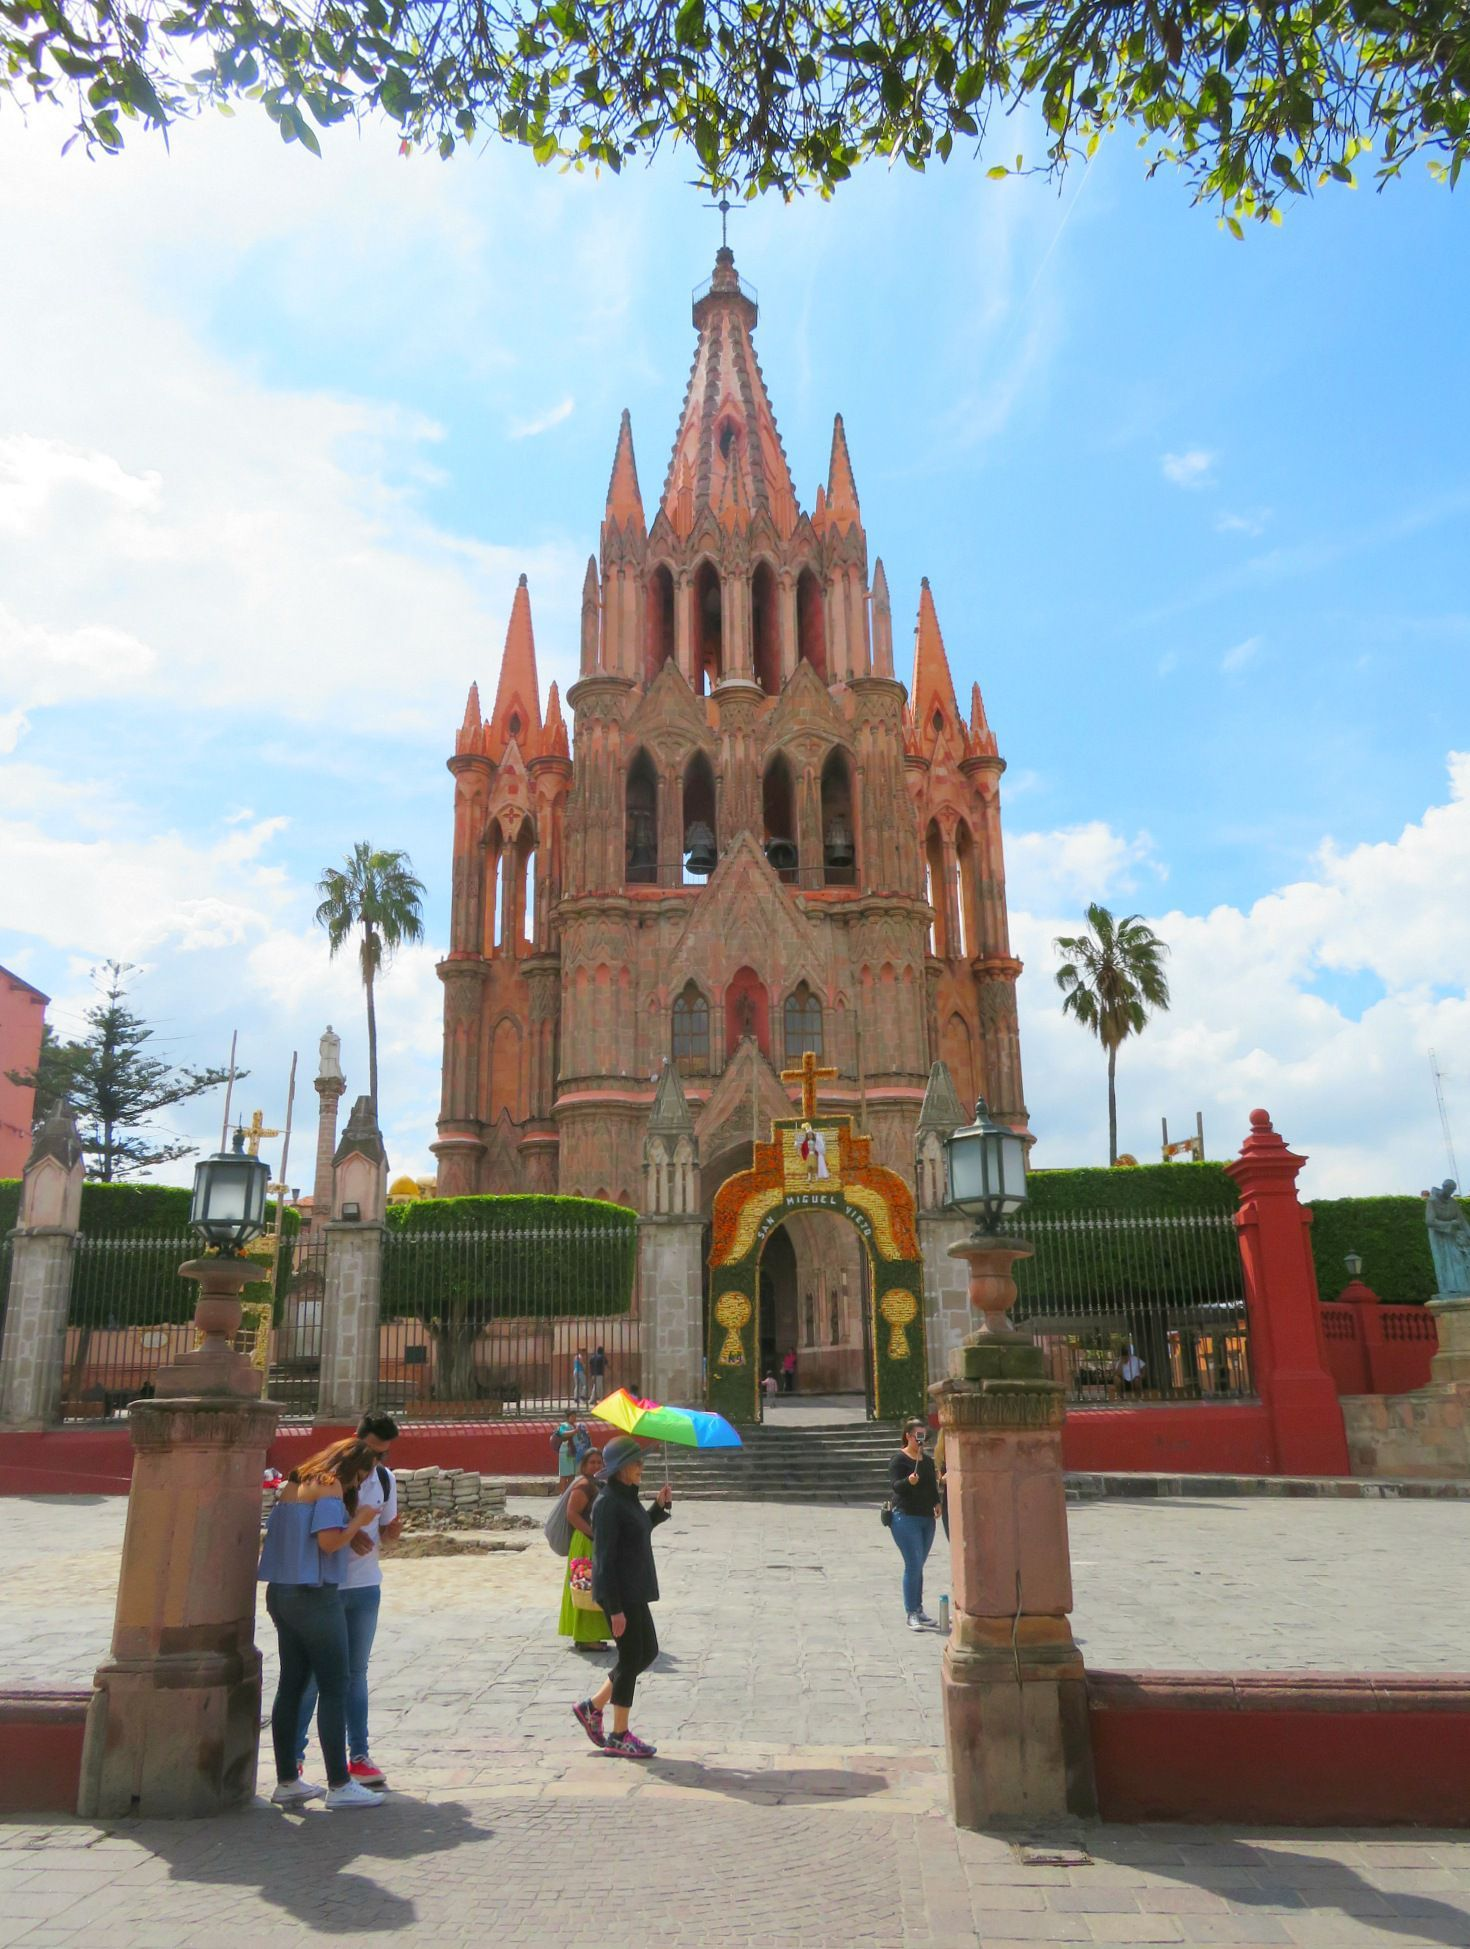 Parroquia San Miguel de Allende de Arcangel ~ What to do in San Miguel de Allende, Mexico with kids